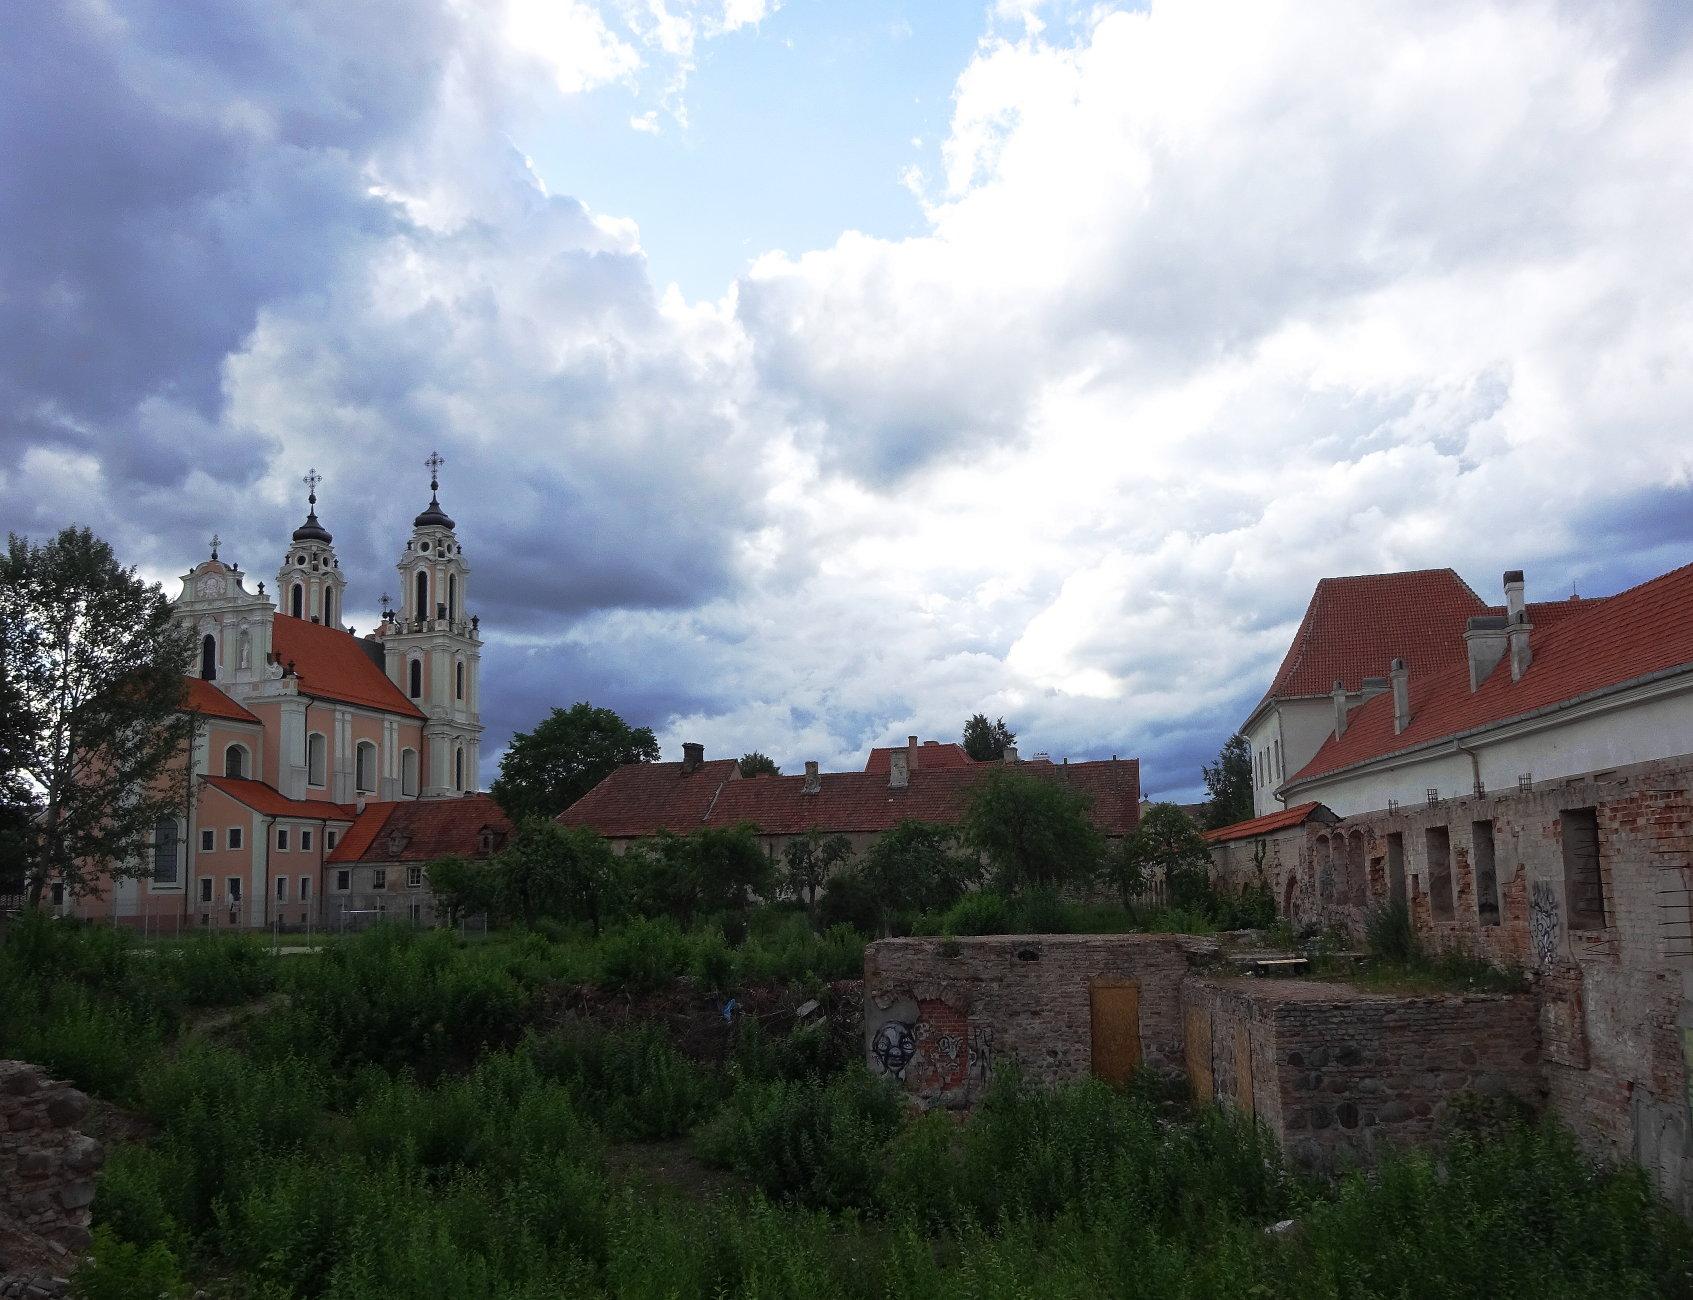 The sky above the church